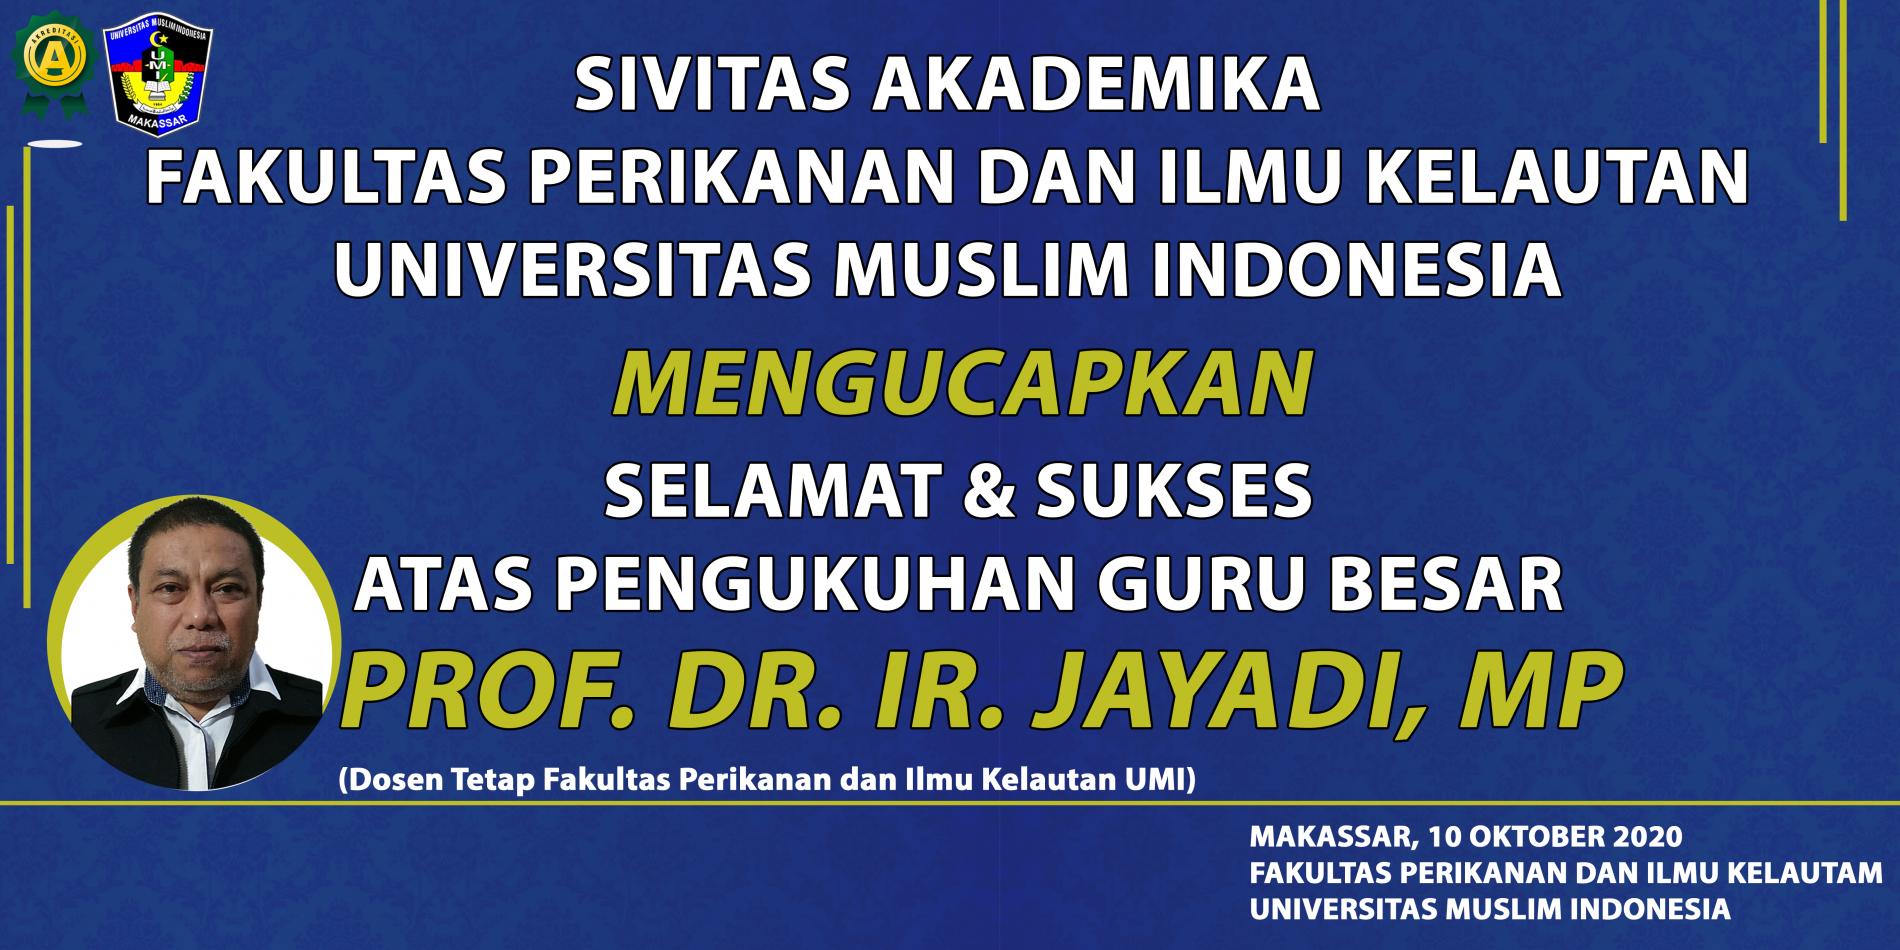 Pengukuhan Guru Besar Prof. Dr. Ir. Jayadi, MP